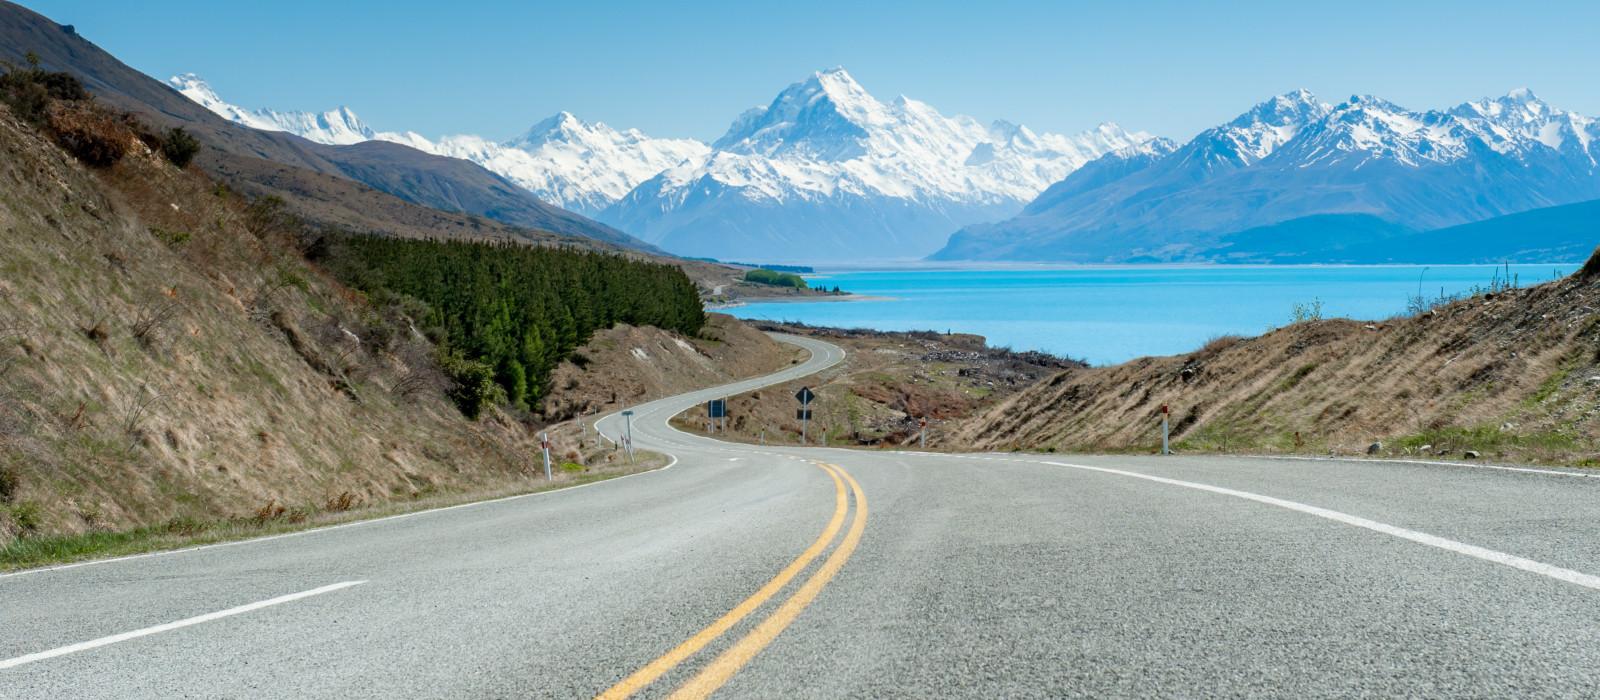 Reiseziel Mount Cook Neuseeland